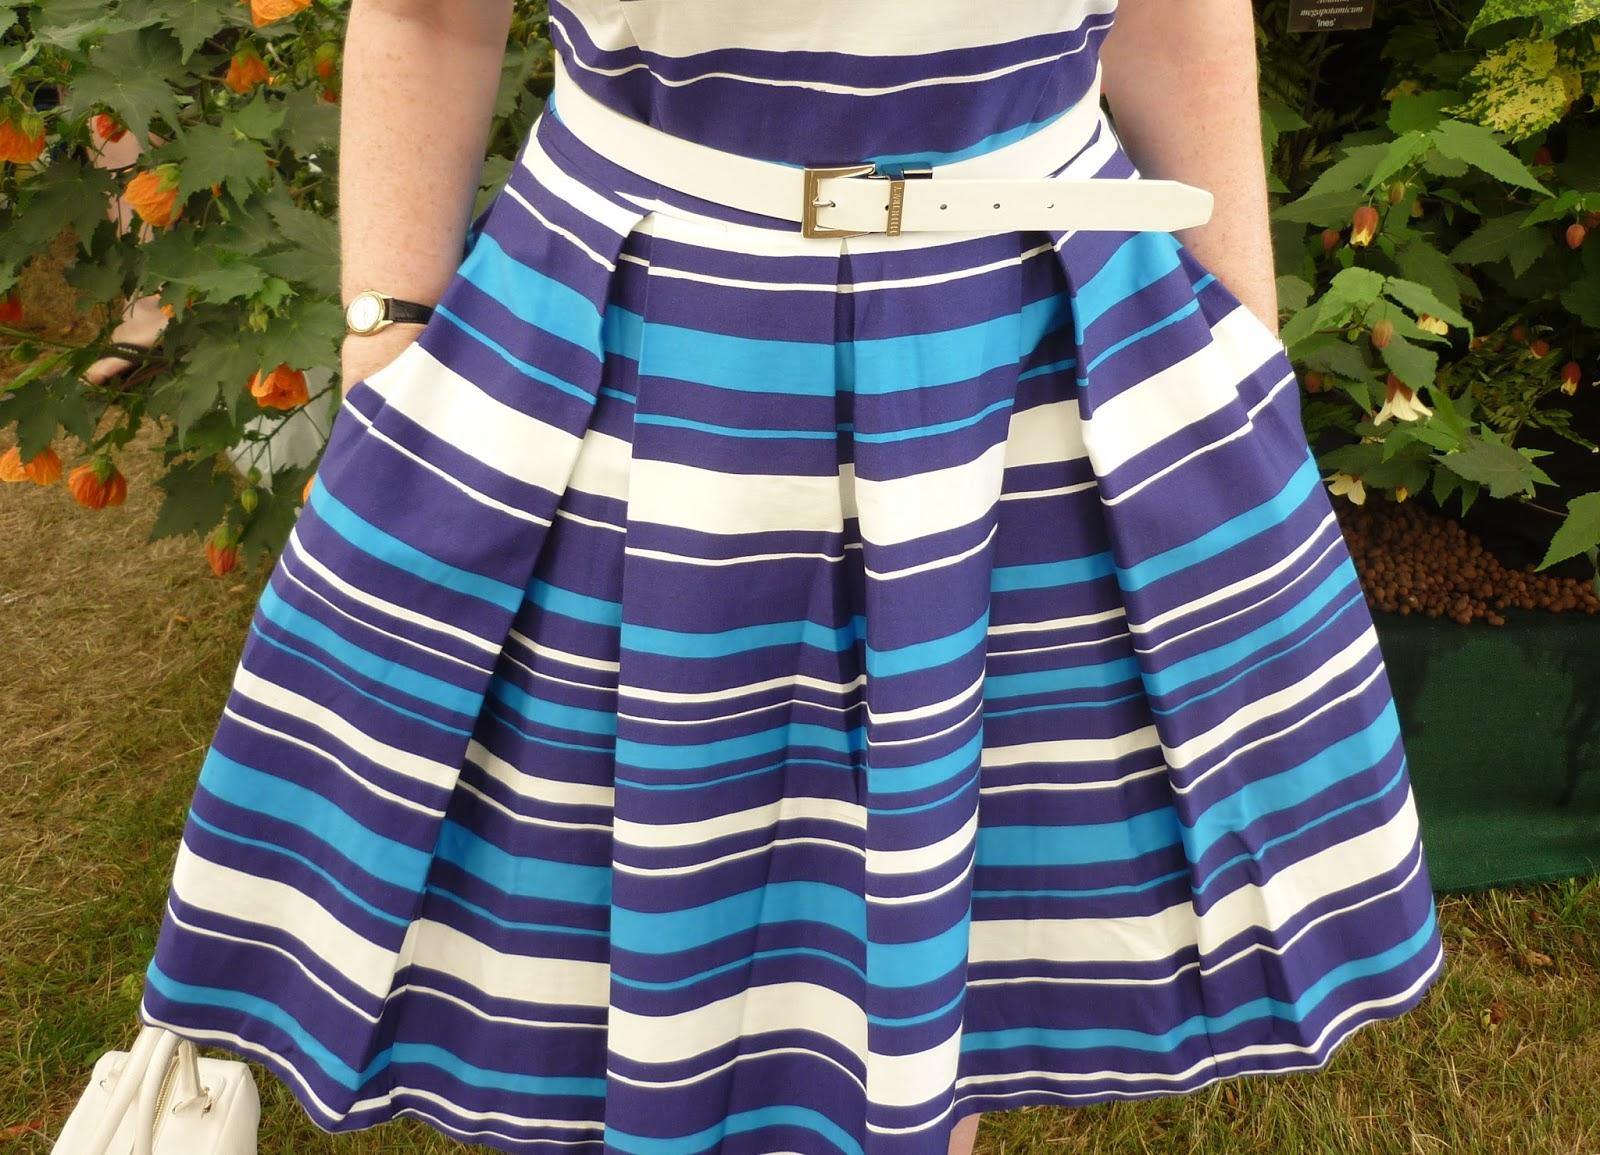 Close up of skirt; PetiteSilverVixen